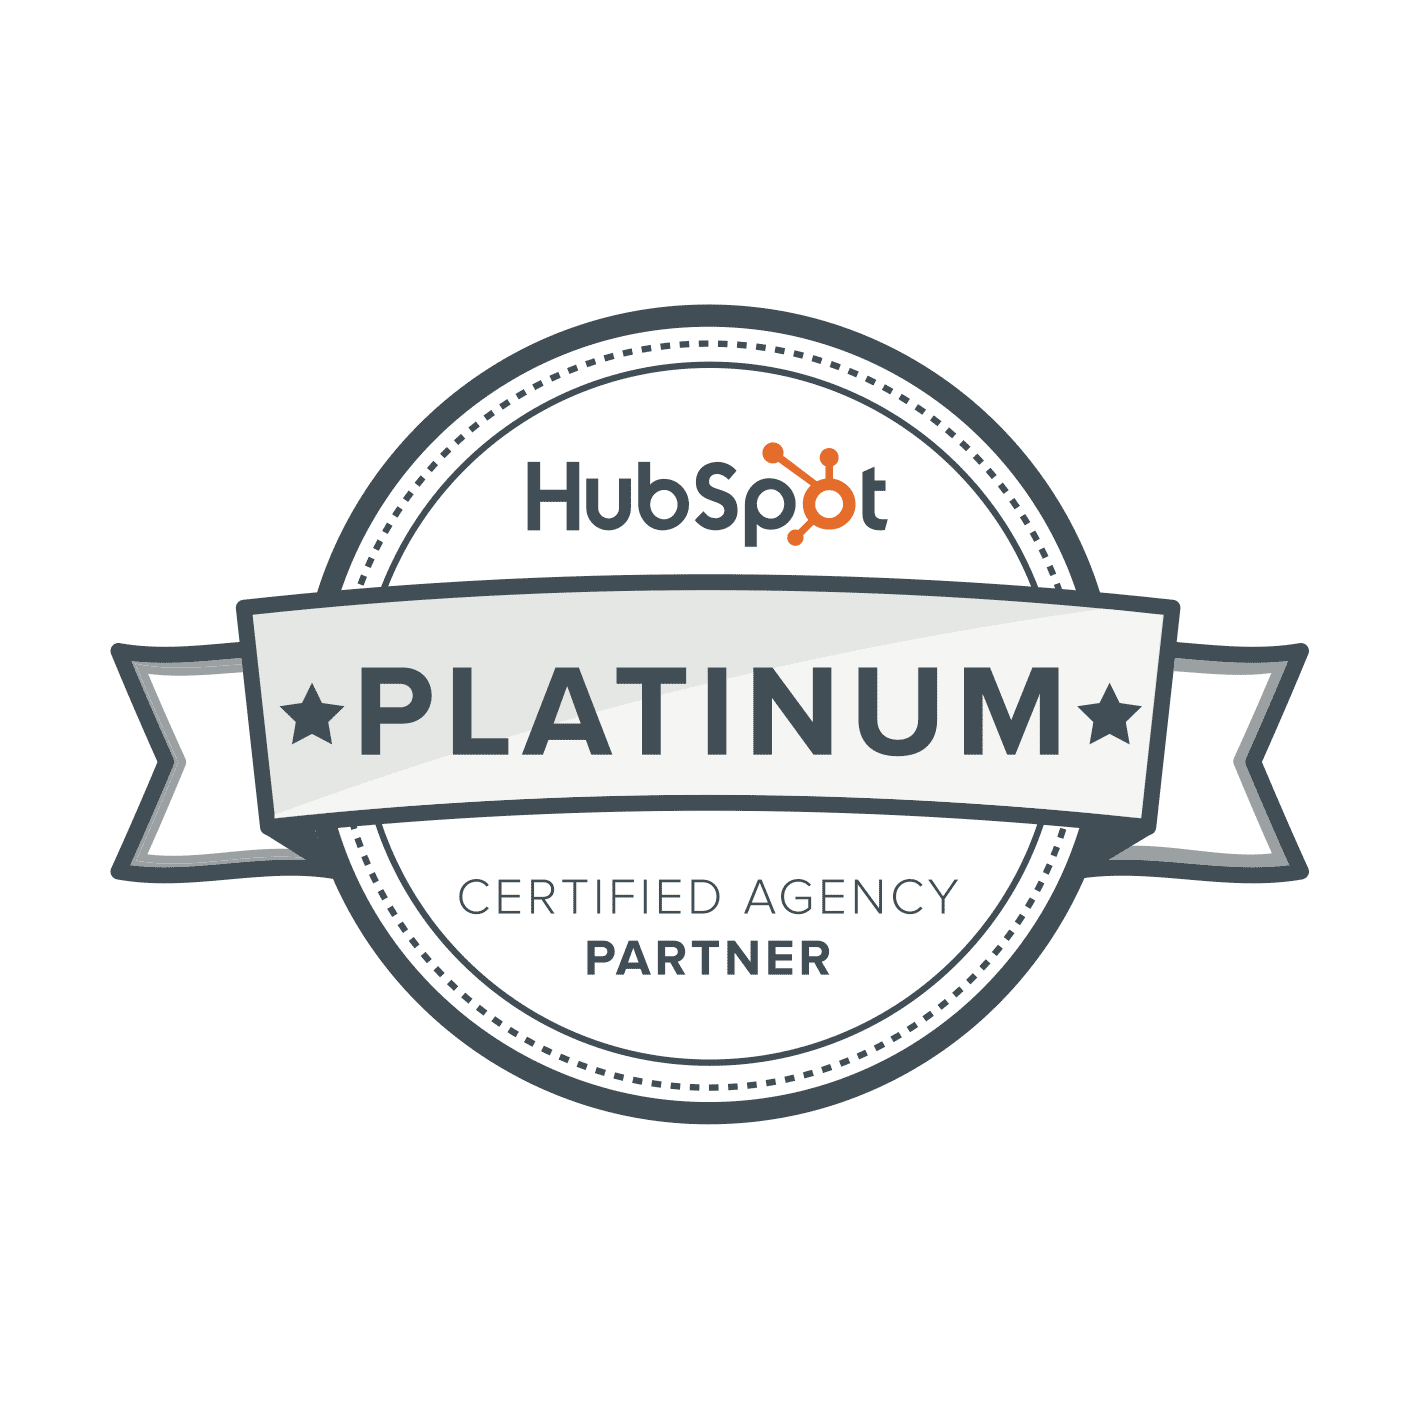 ROI Online is a Platinum HubSpot Partner Agency